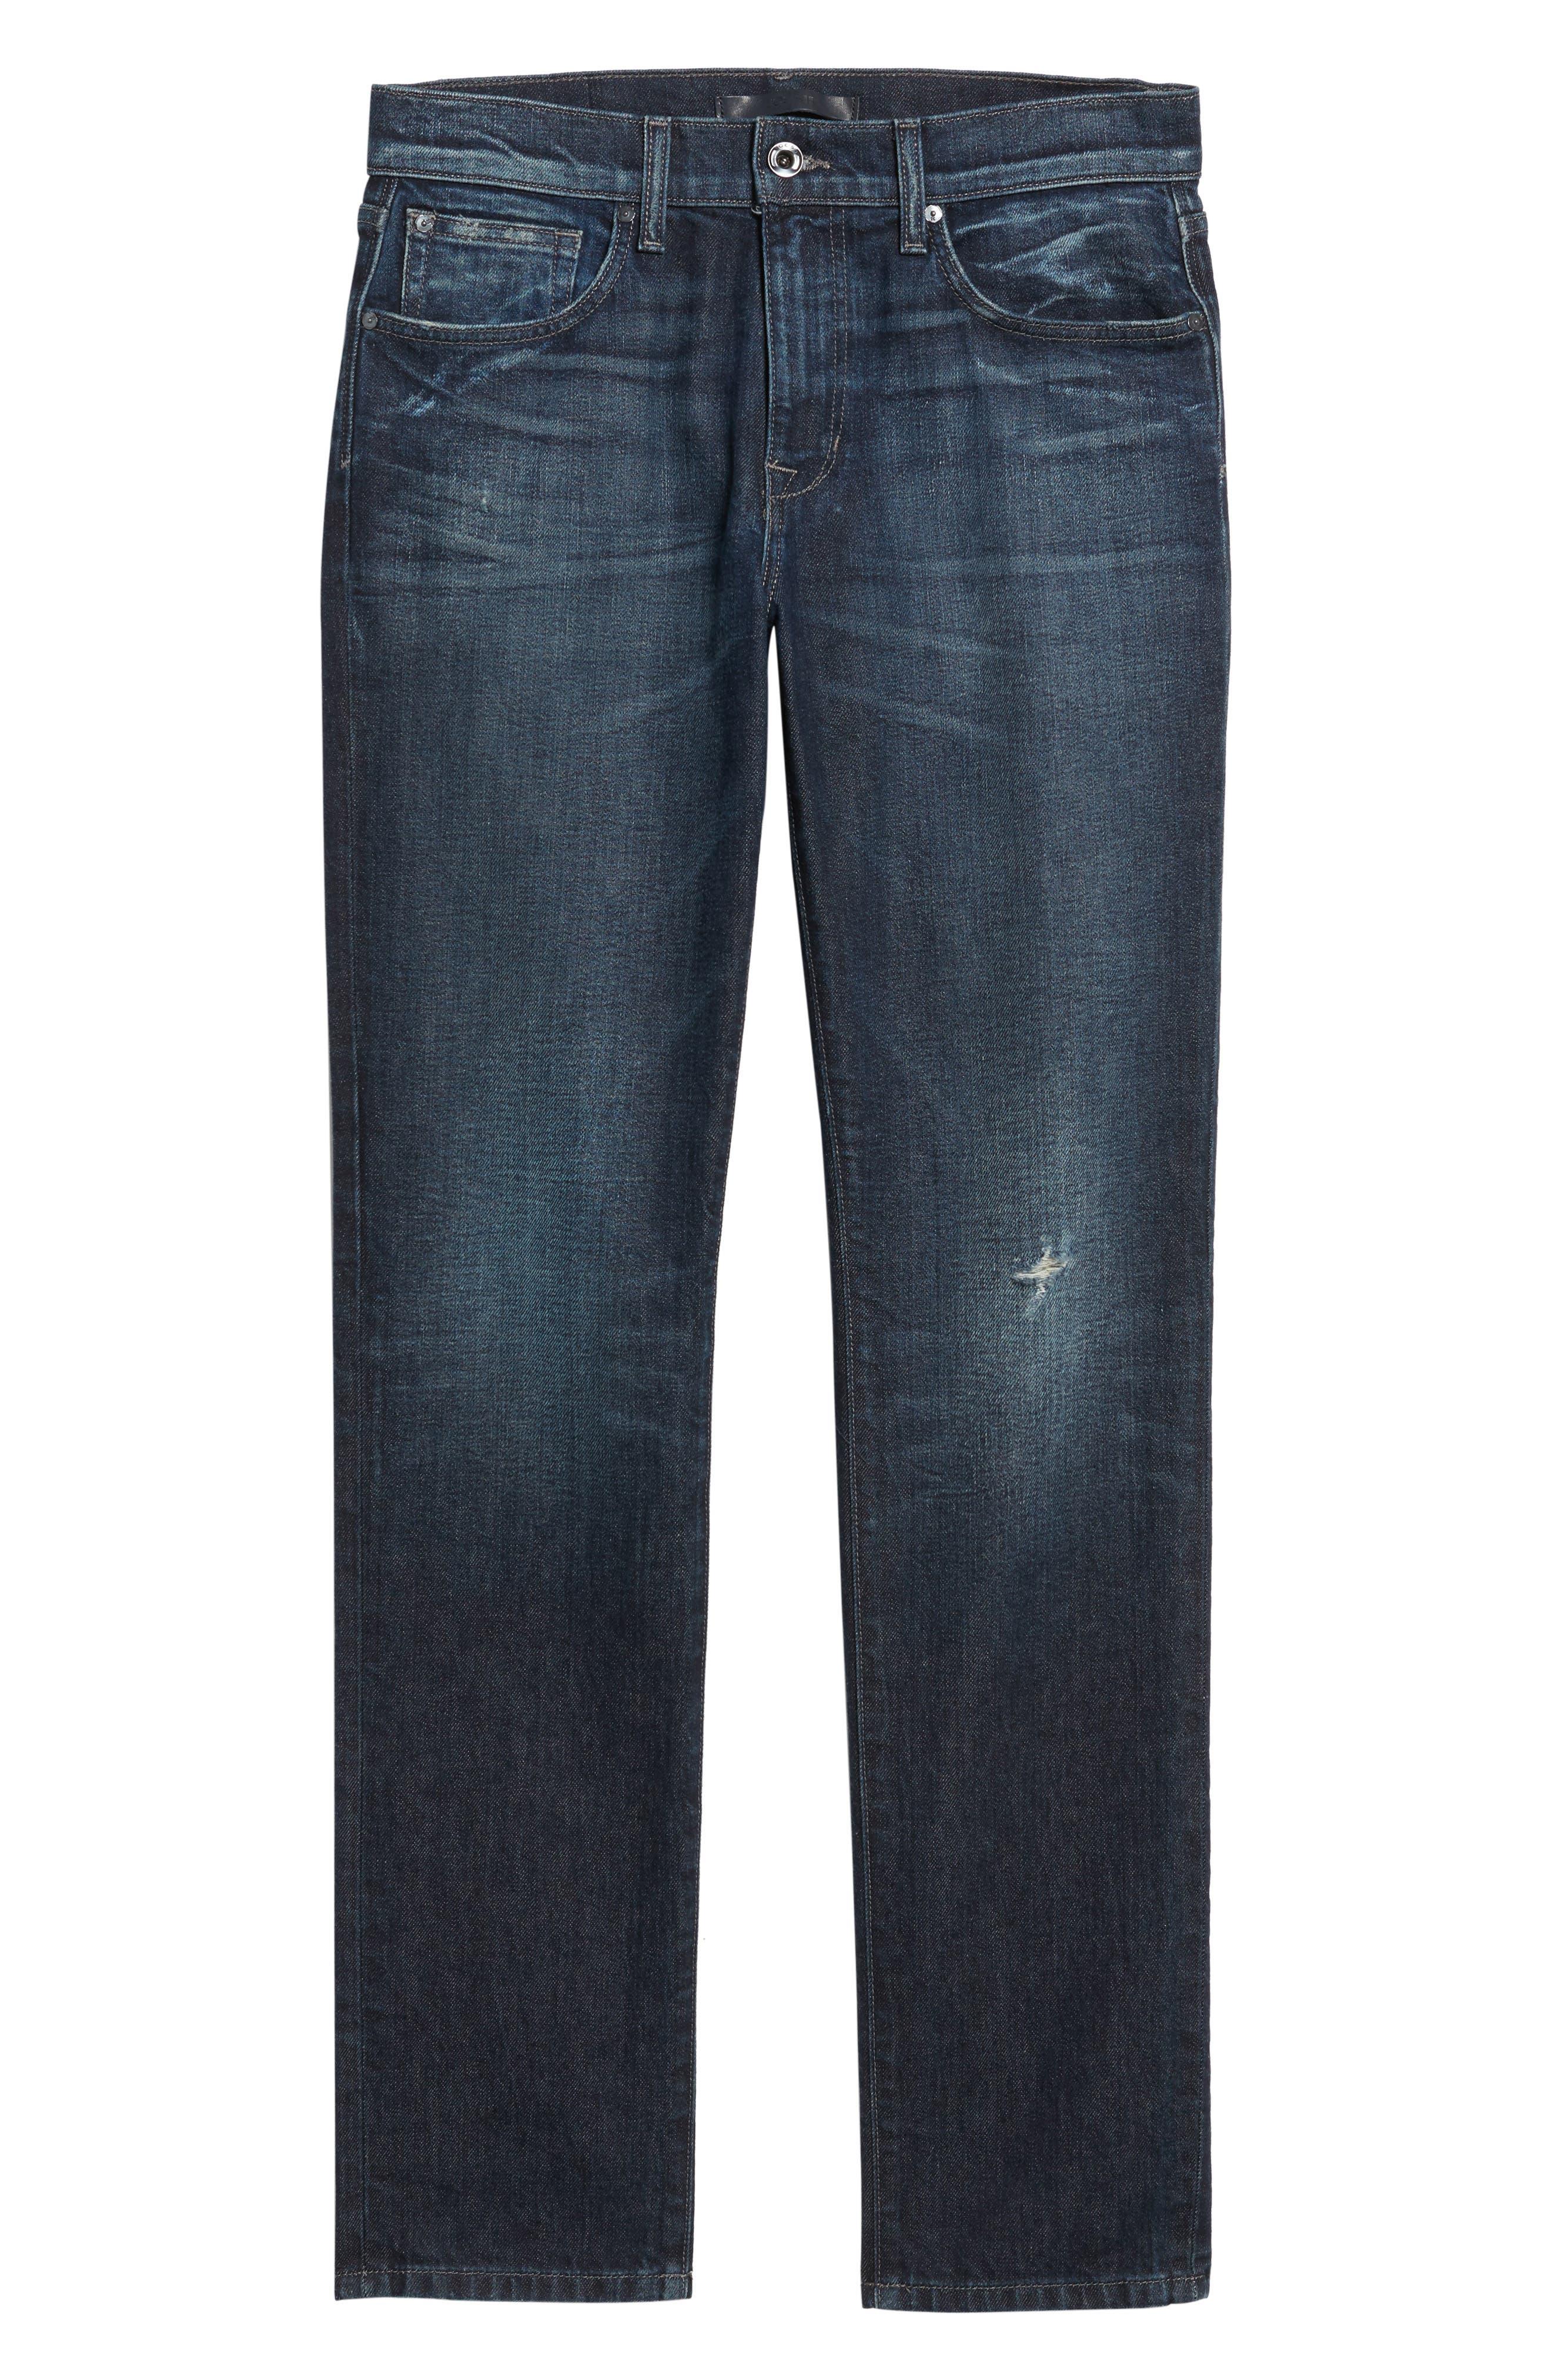 Brixton Slim Straight Leg Jeans,                             Alternate thumbnail 6, color,                             415